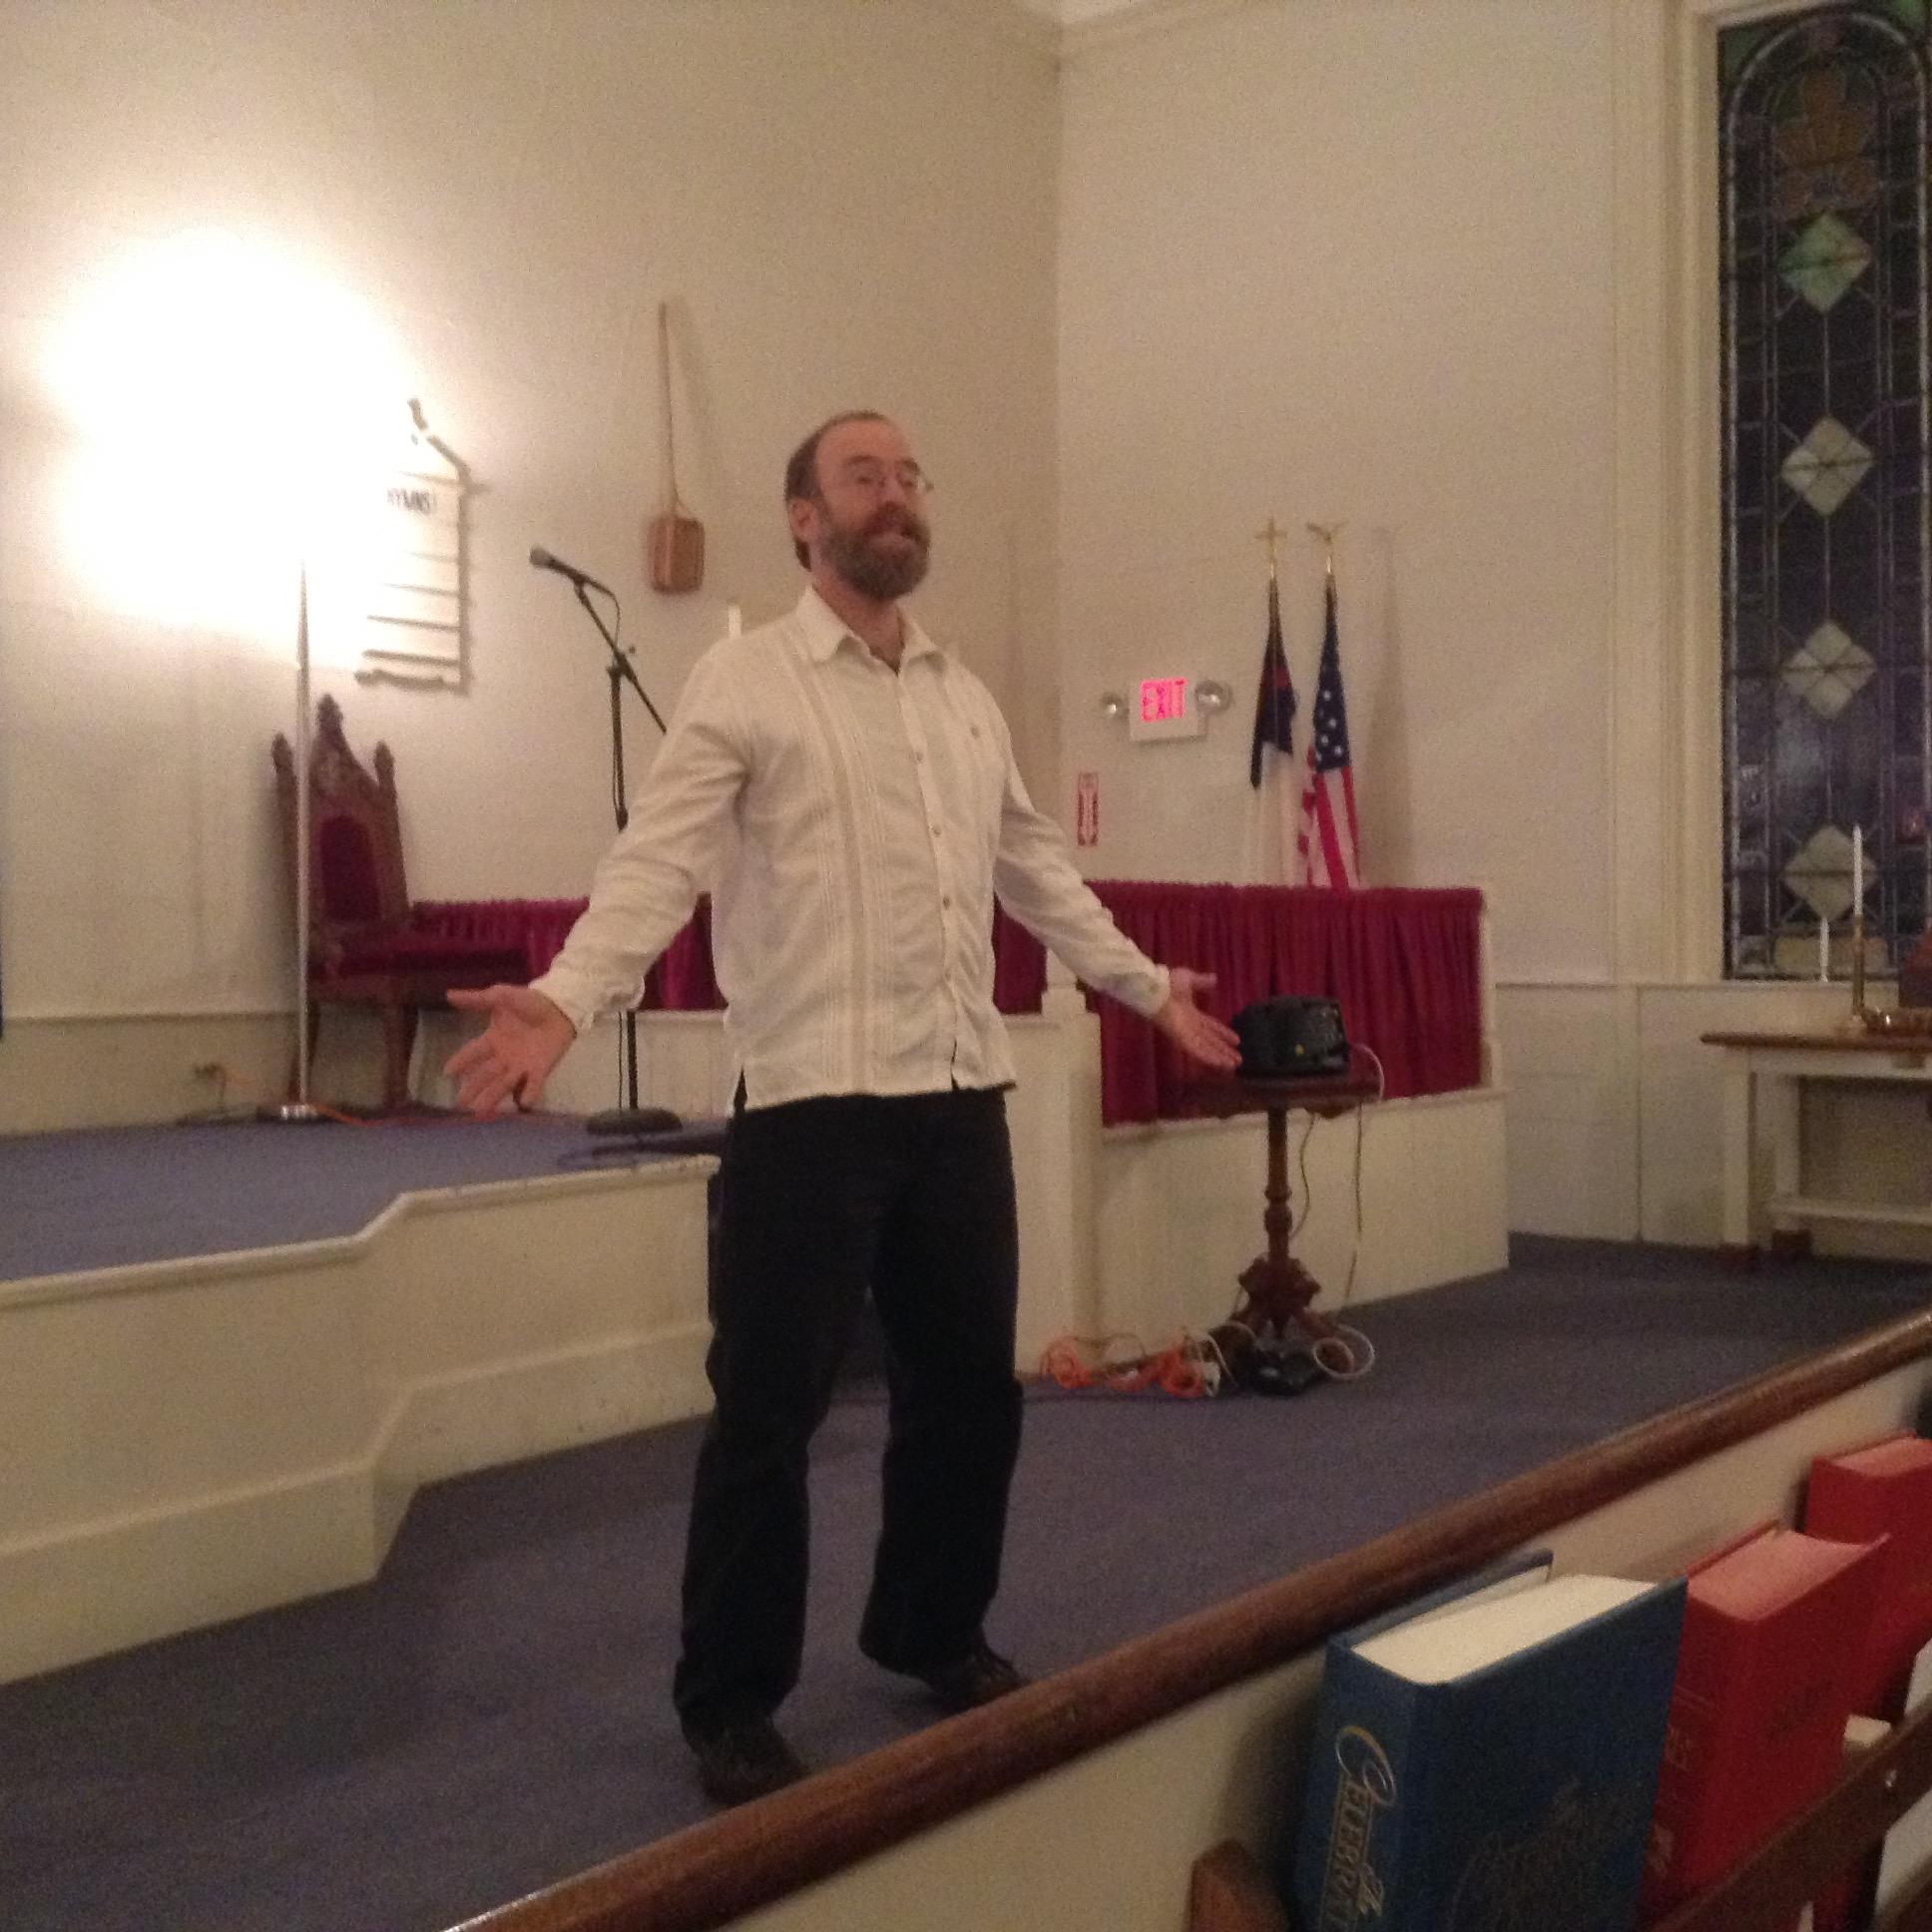 Storyteller Andy Davis